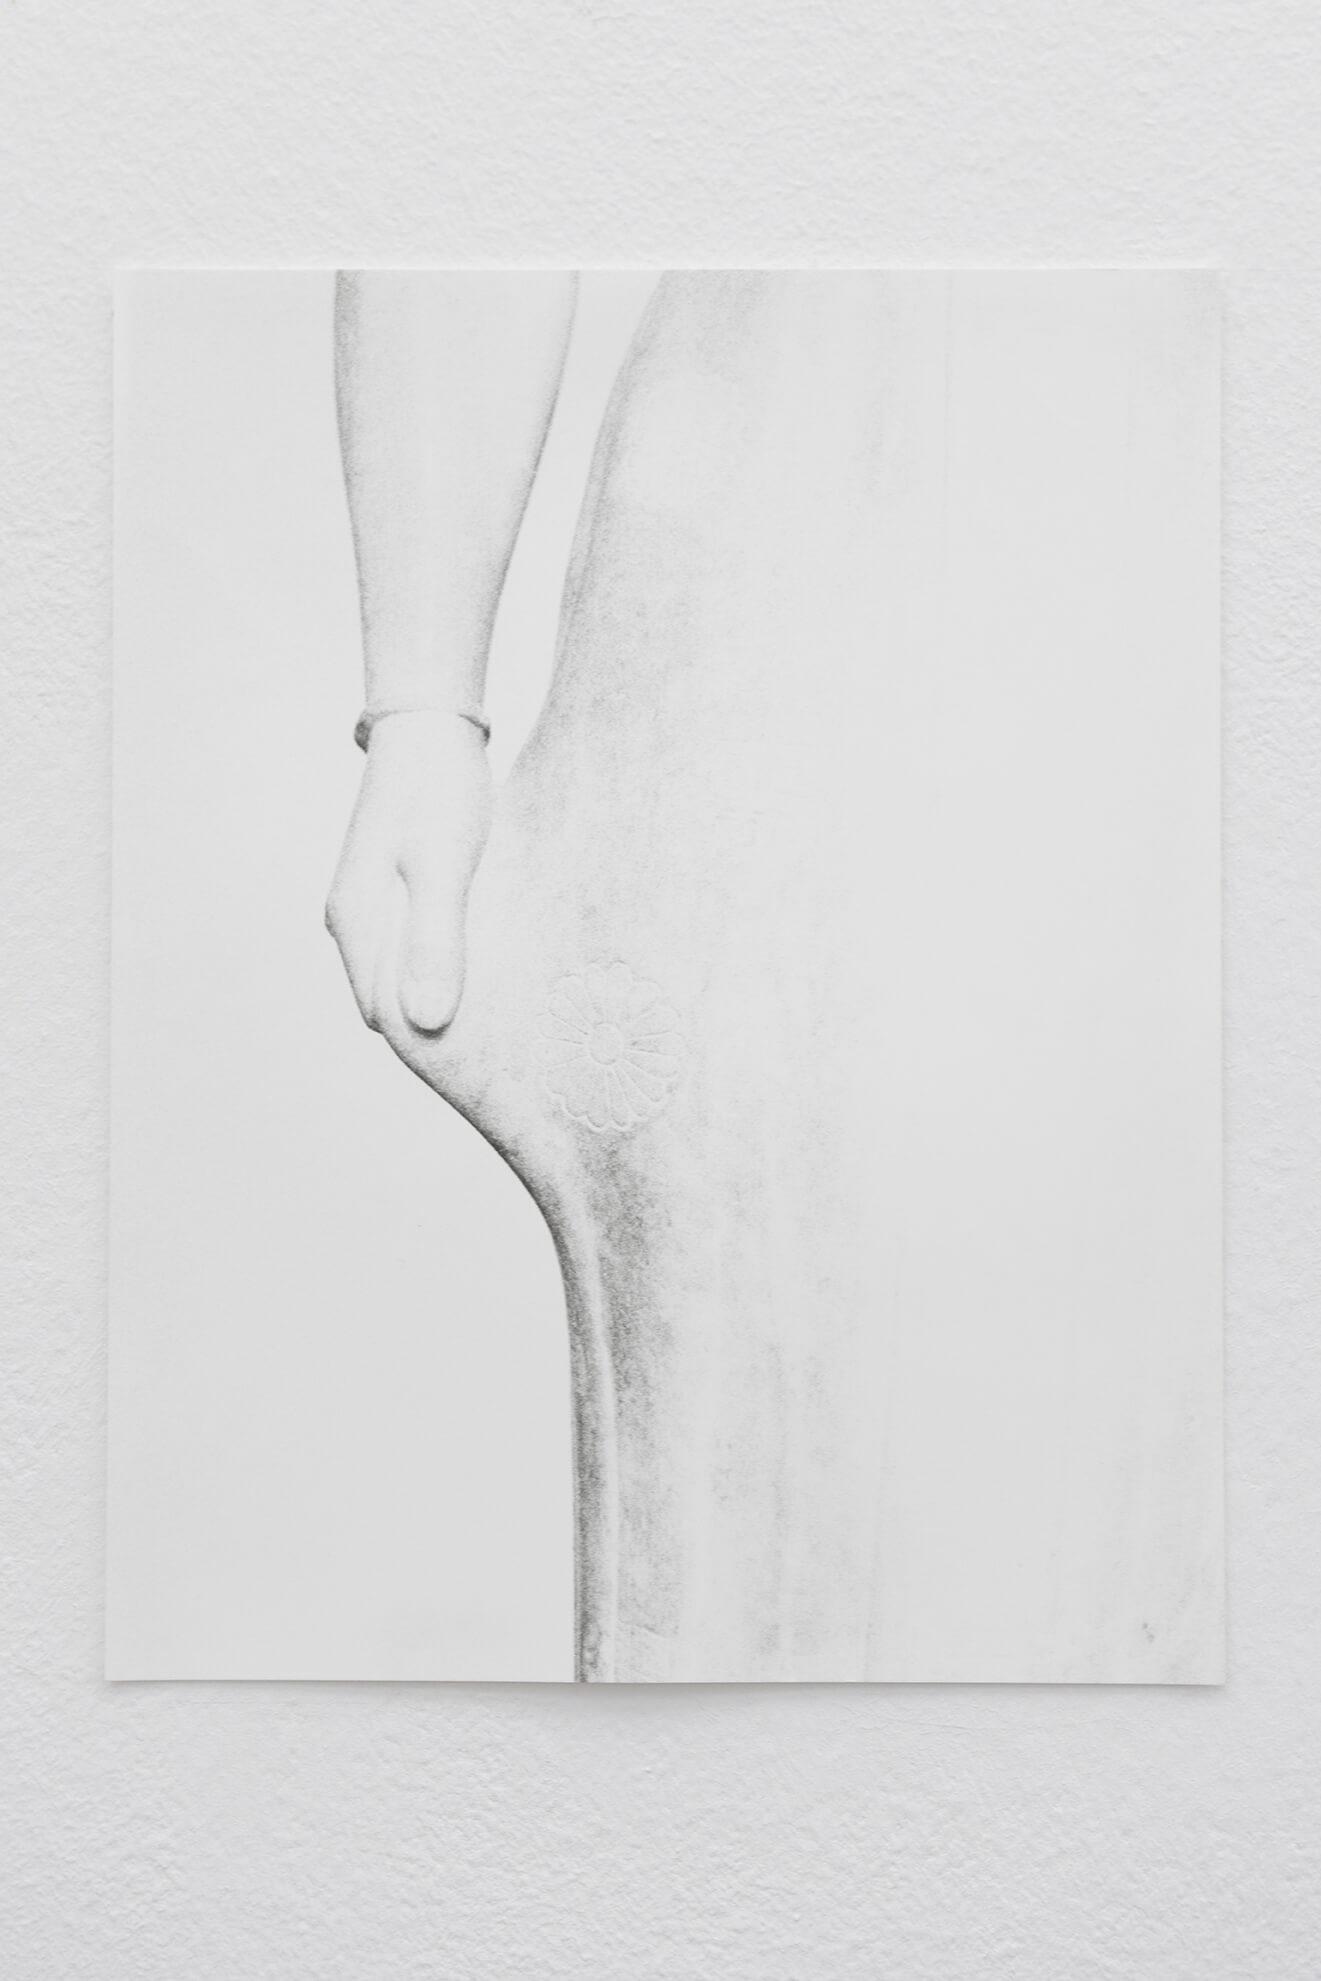 Untitled (Kore), 2020 | JOCHEN LEMPERT: VISIBLE LIGHT | ProjecteSD